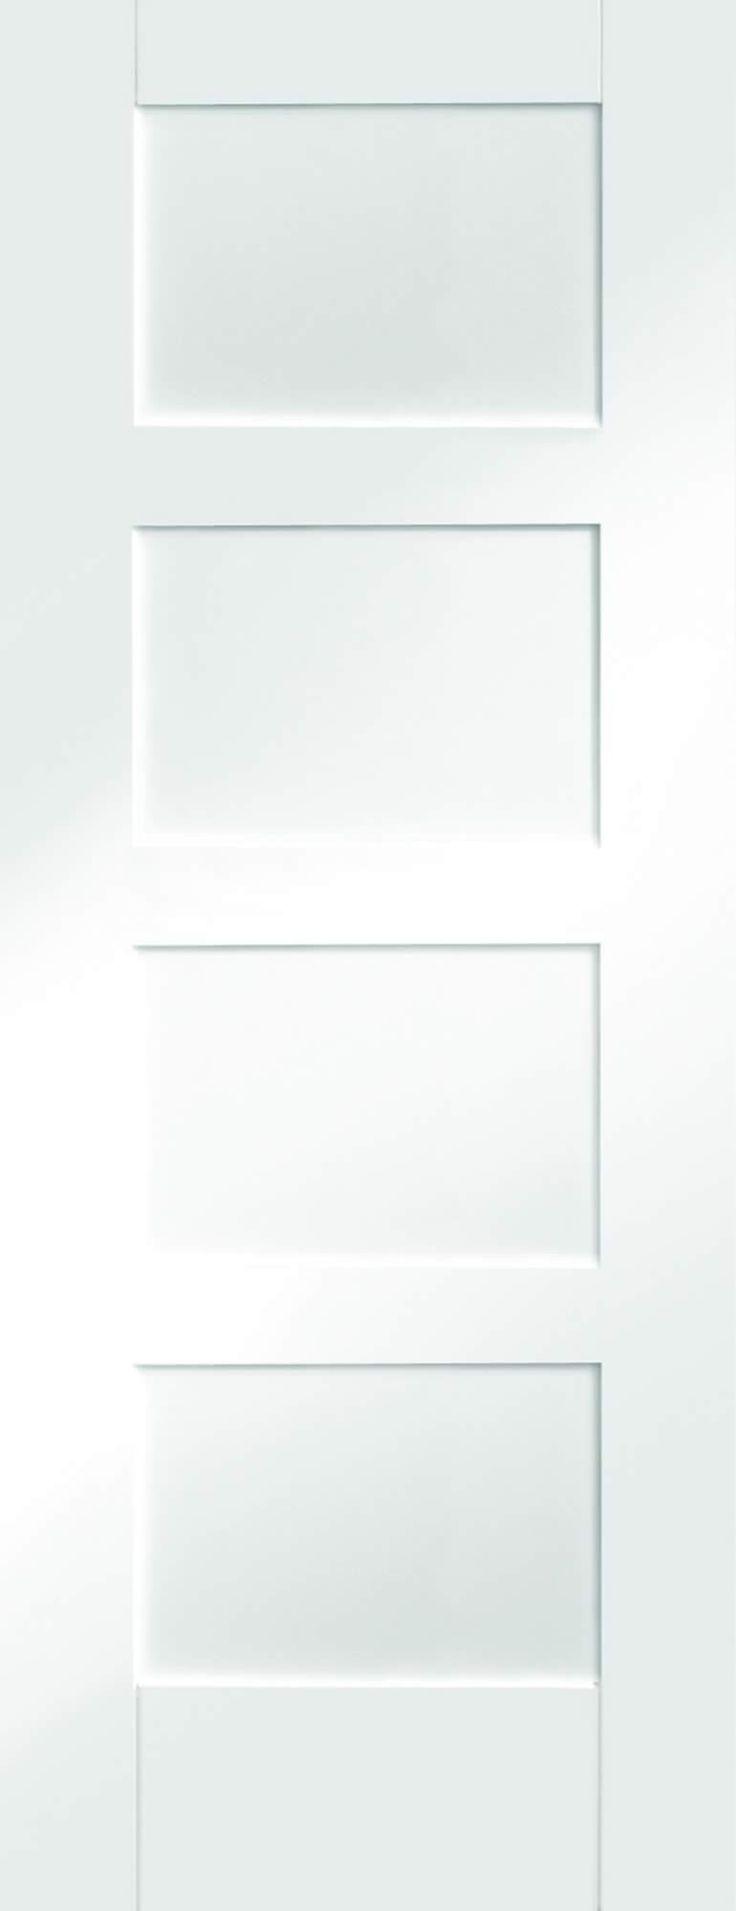 4 Panel White Interior Doors best 25+ 4 panel shaker doors ideas on pinterest | shaker doors, 1